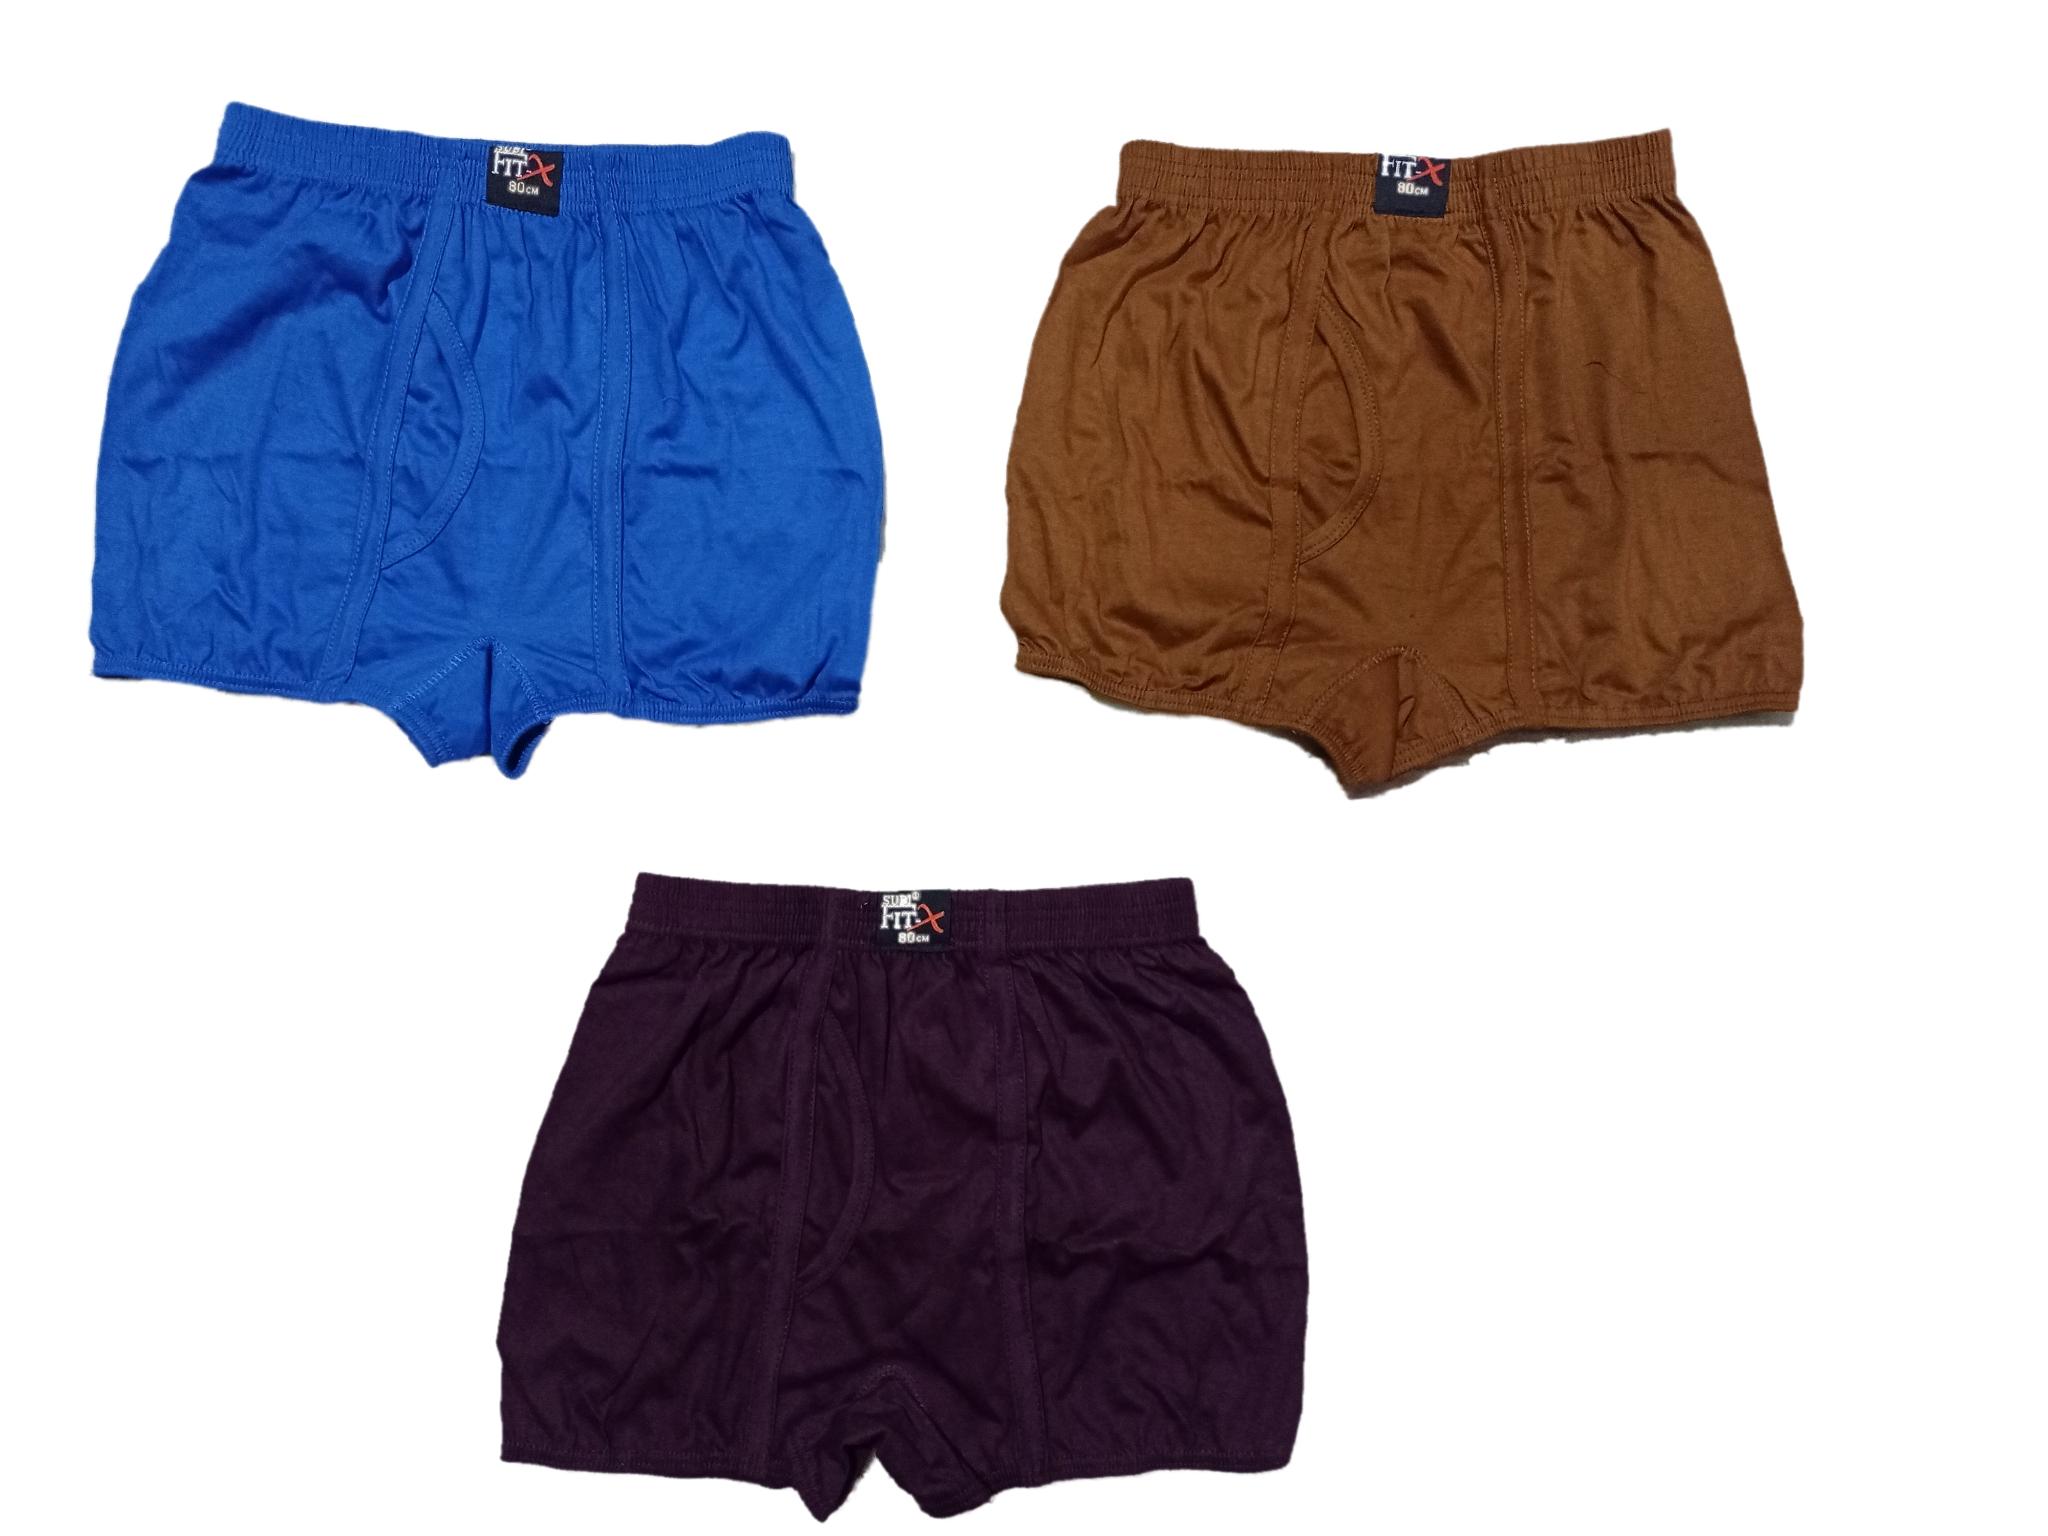 Men's Long Cotton Inner Wear Cotton Brief Gents Full Trunks for Boys Multicolor,Pack of 3